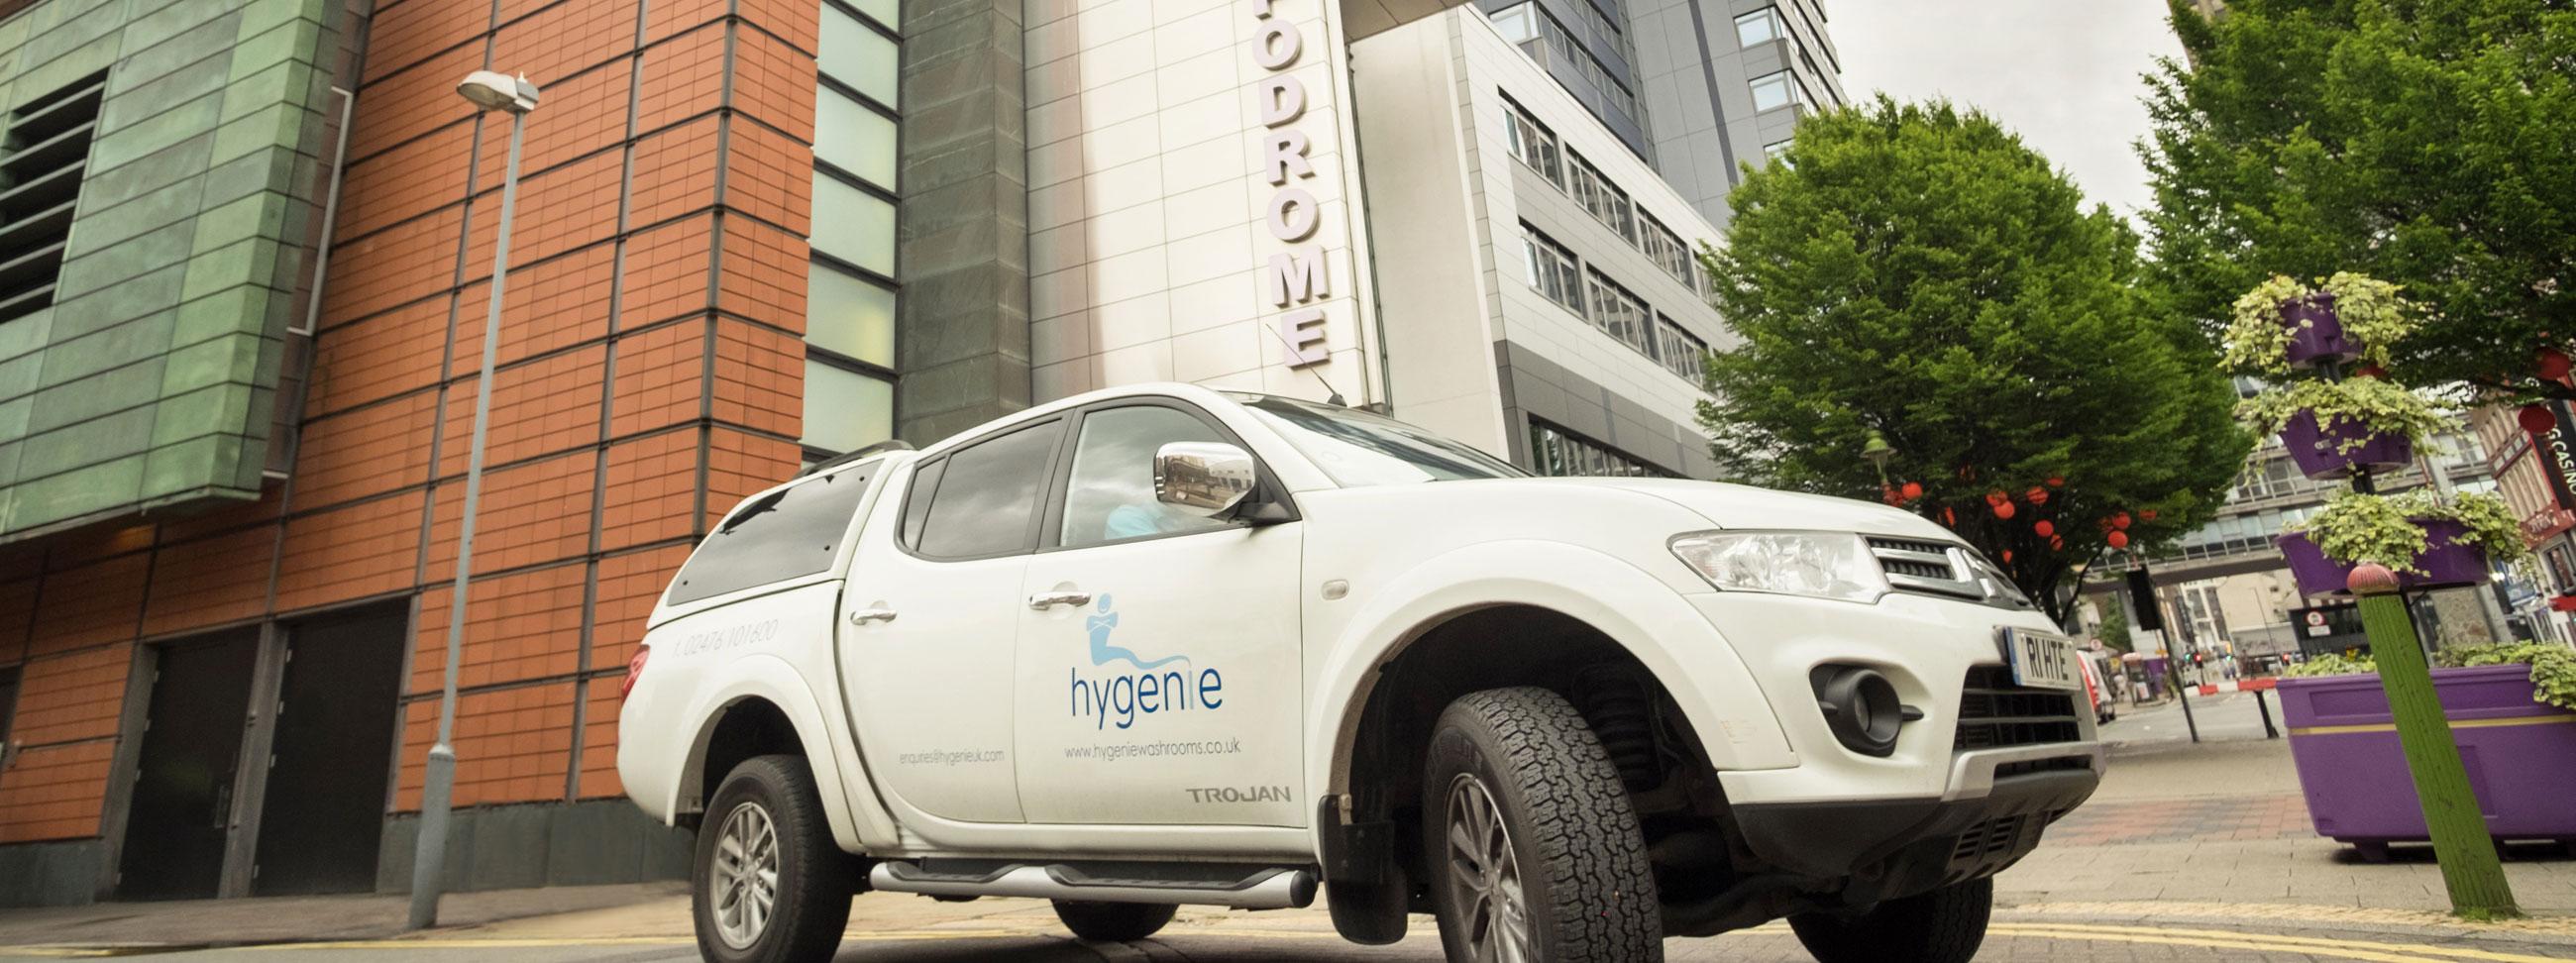 Meet the Hygenie team! Birmingham UK